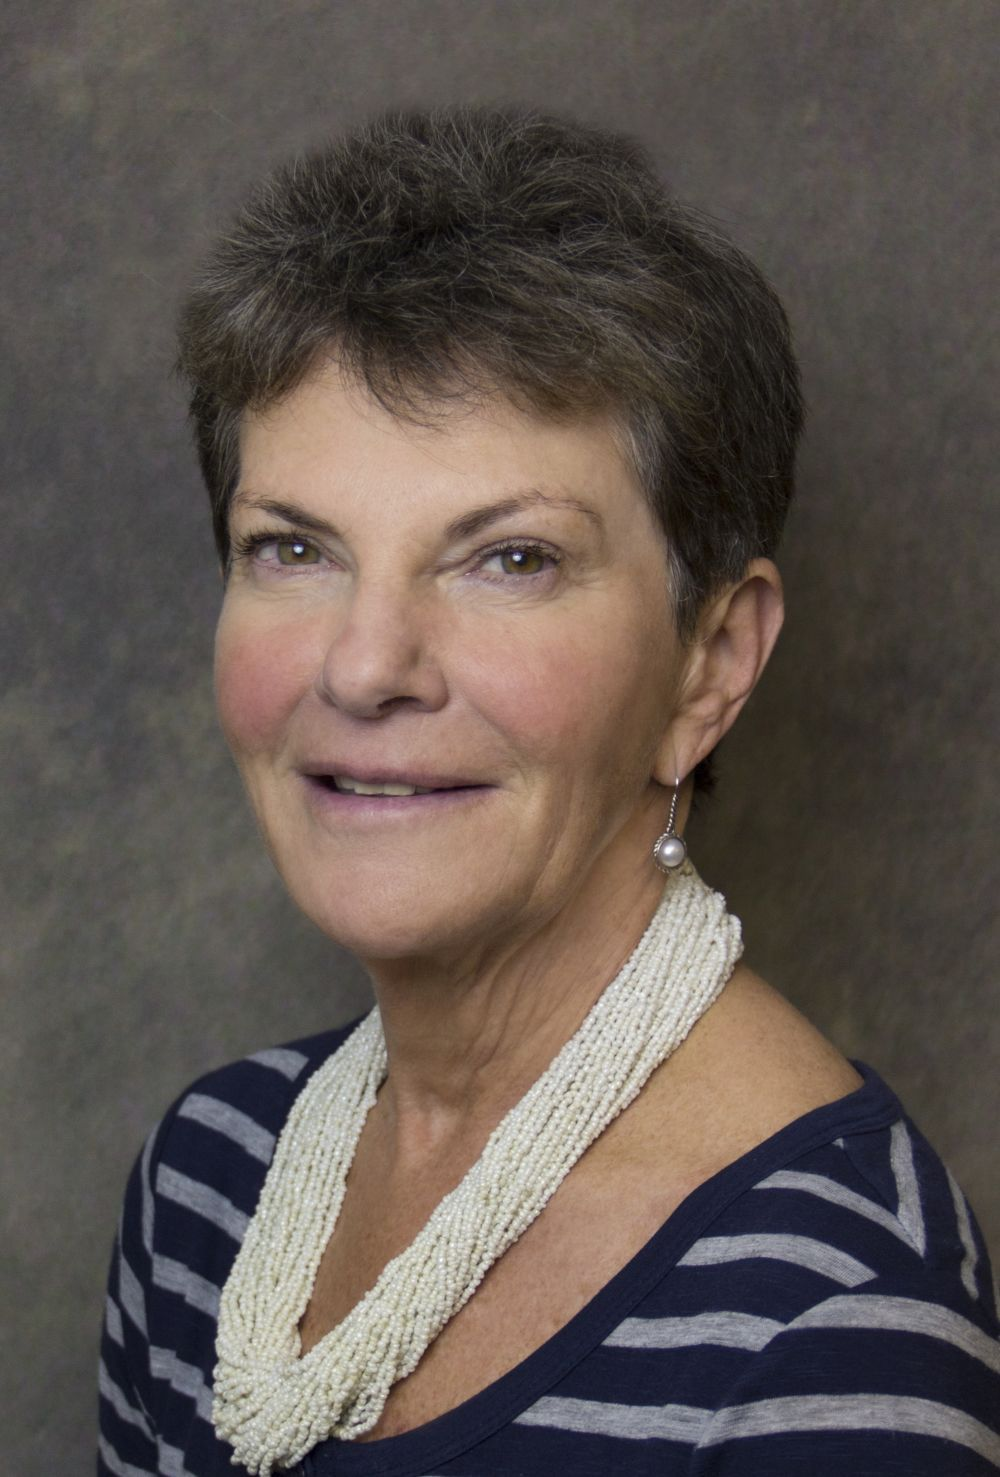 Hunterdon Healthcare adds new gynecologist to staff